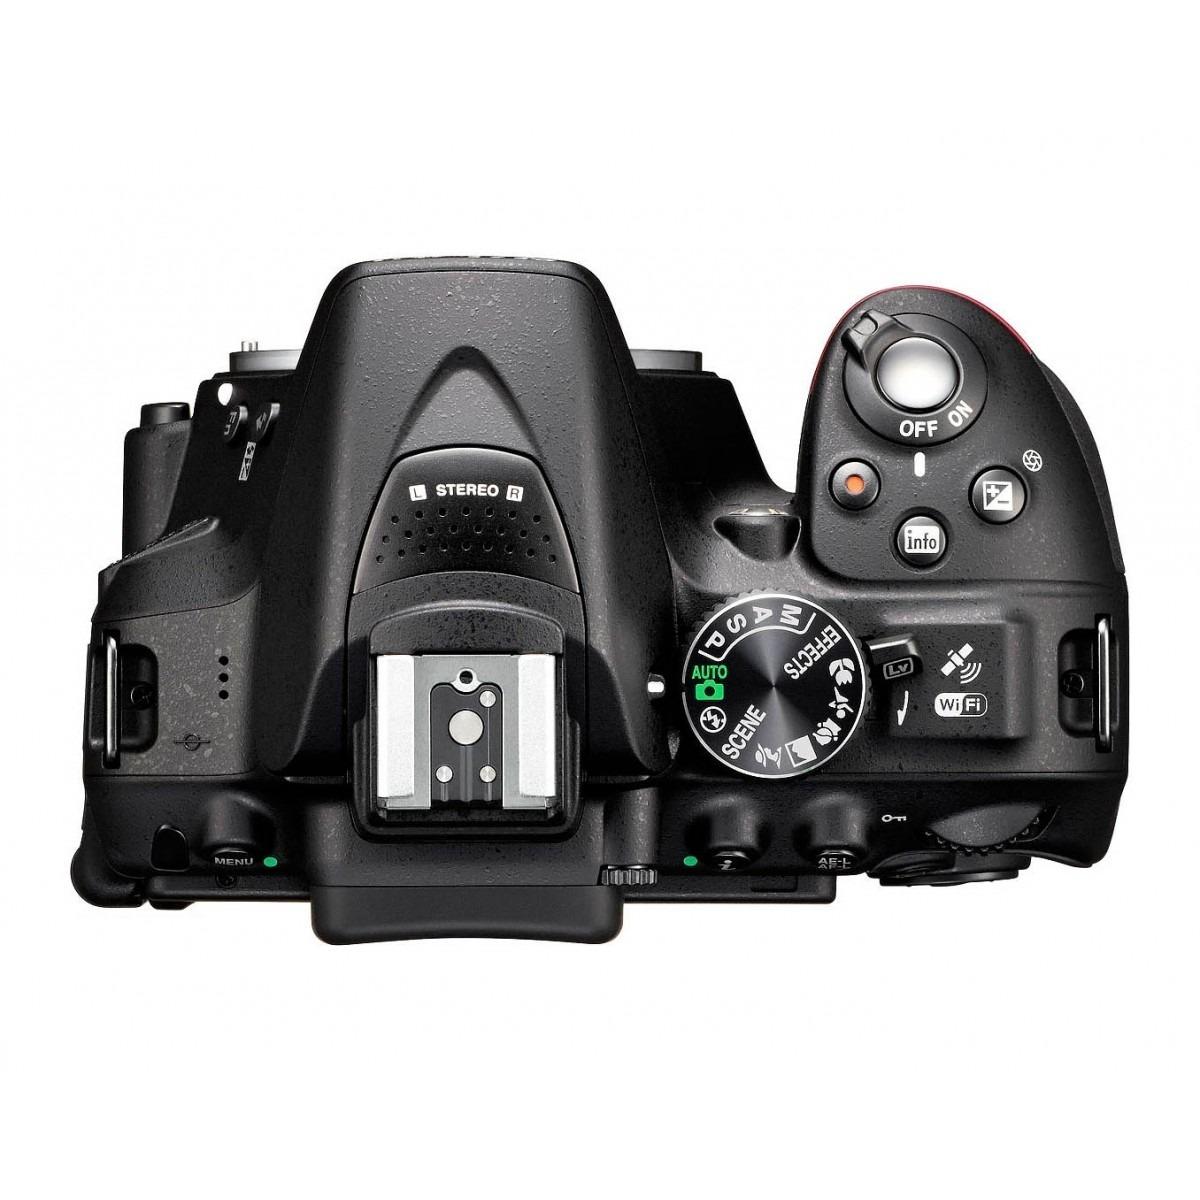 Câmera Nikon D5300 Dslr Com Kit De Lente Af-p 18-55mm